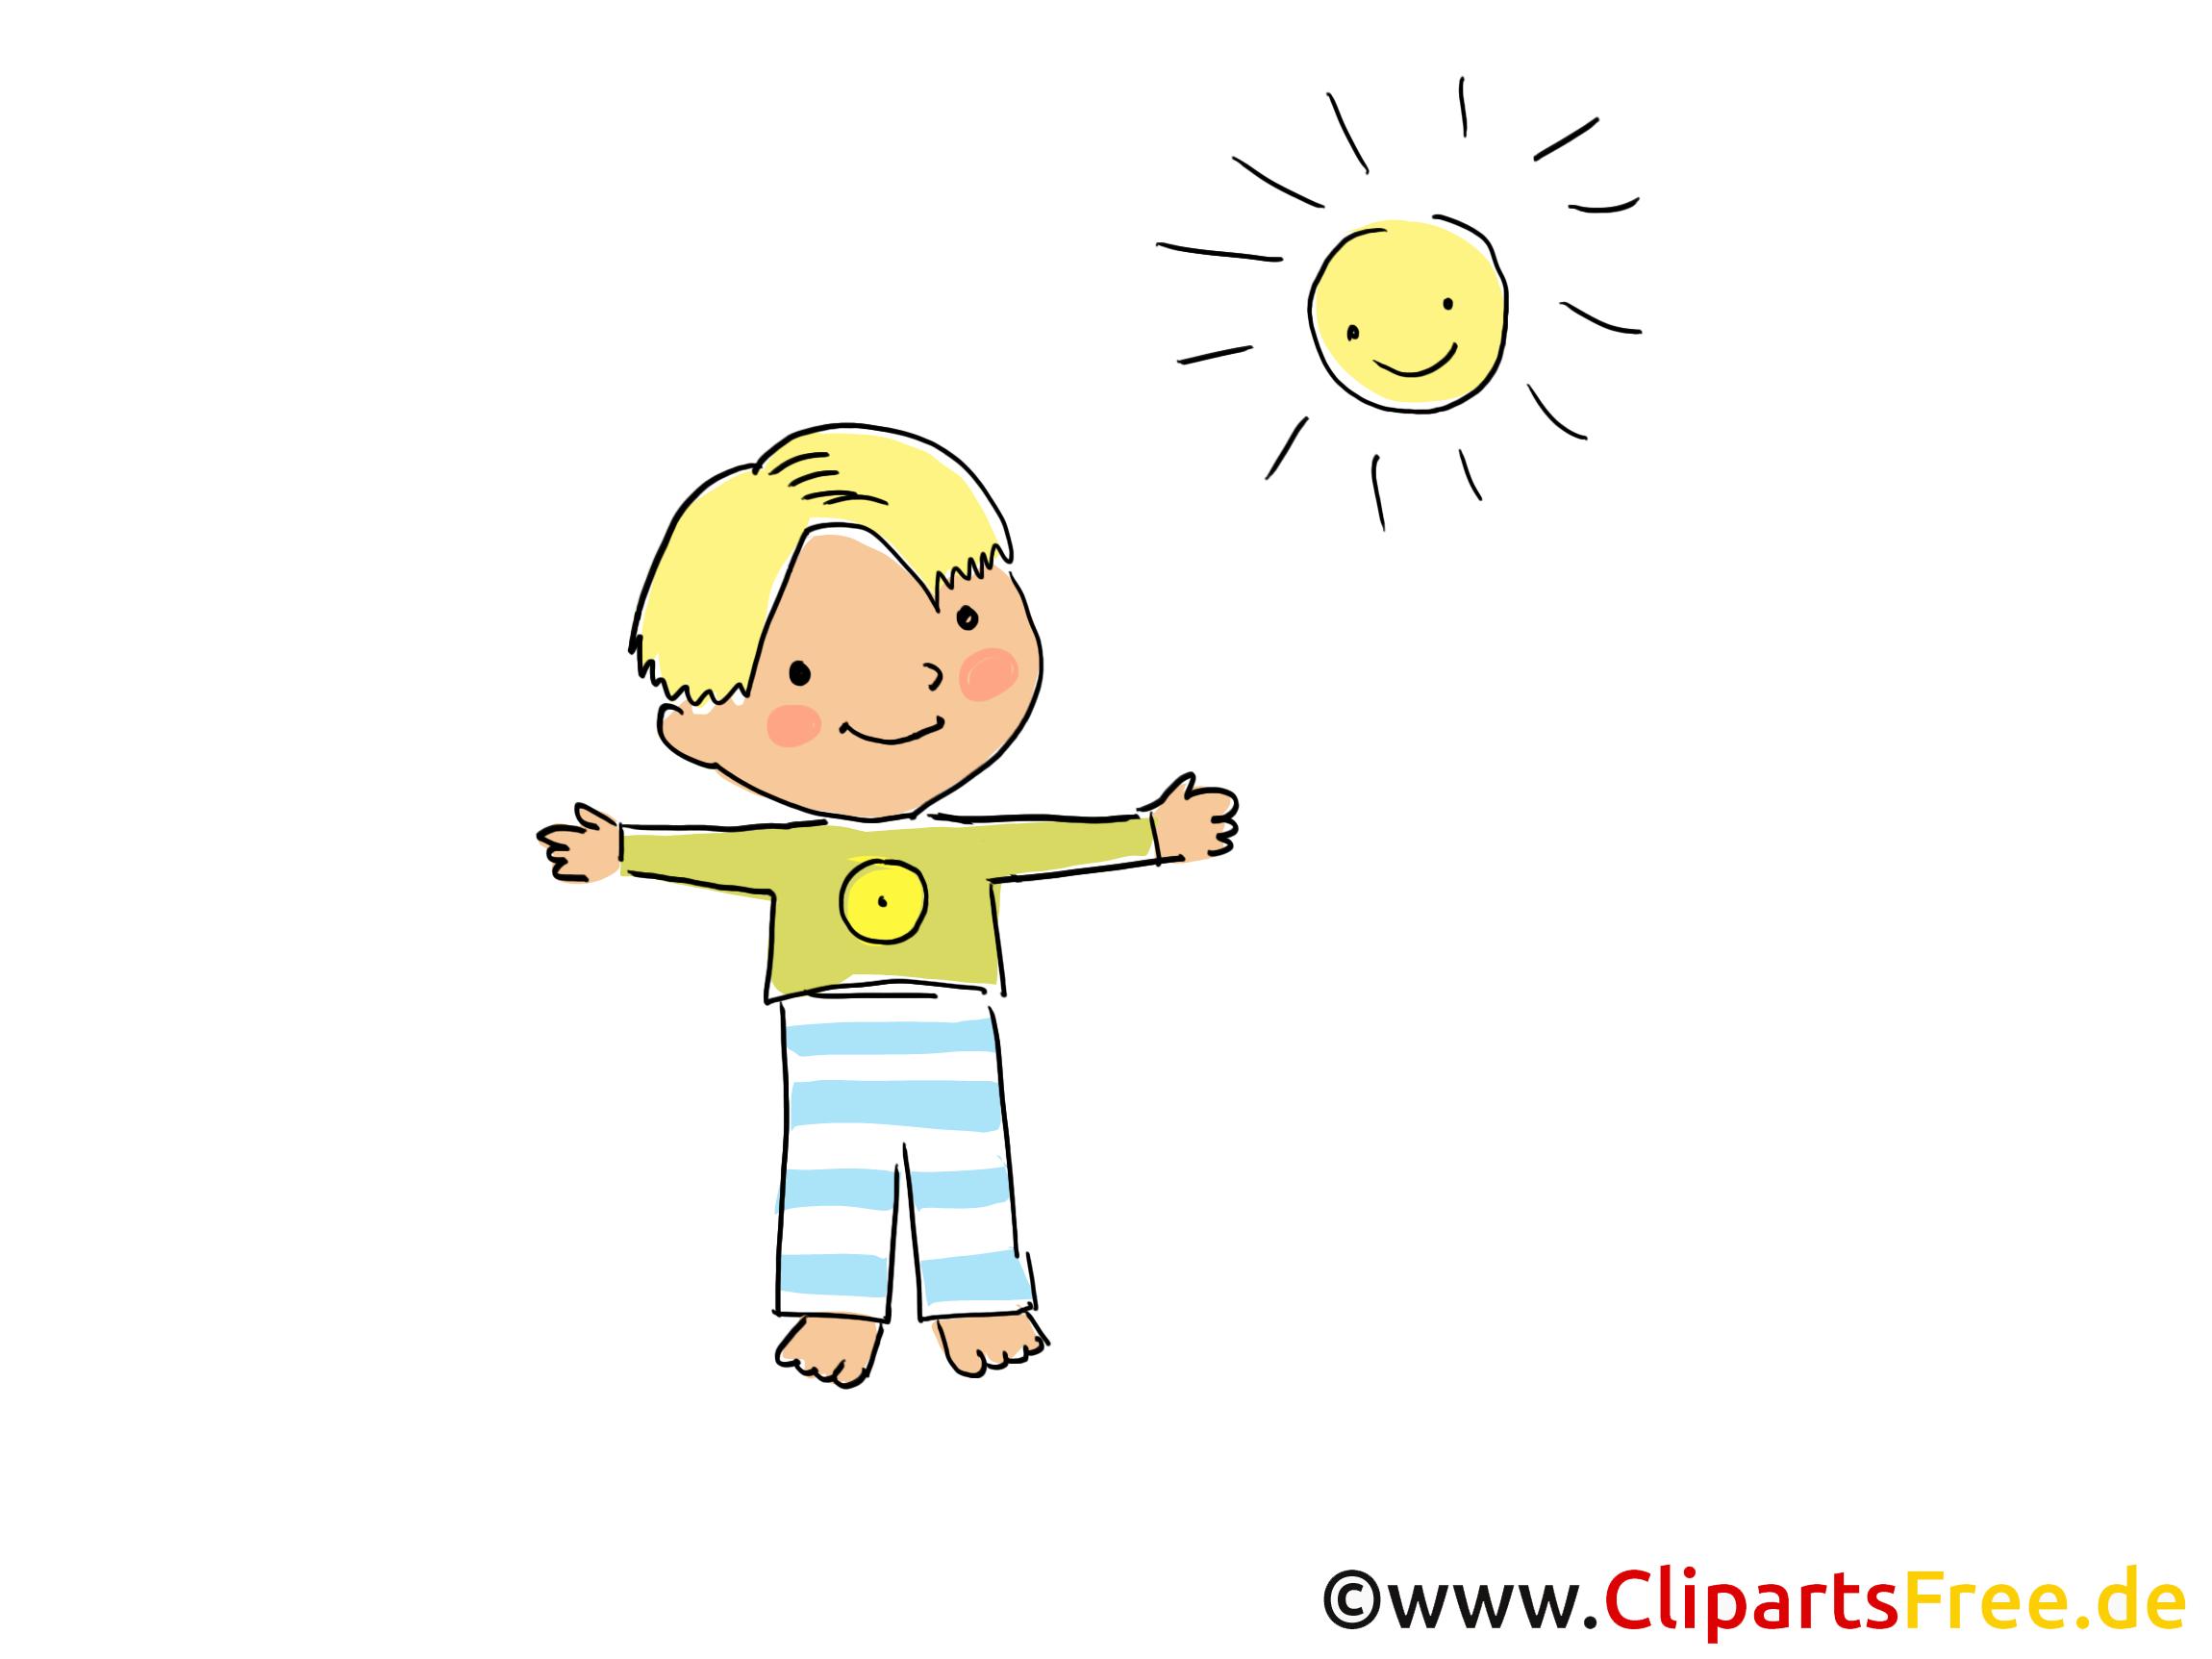 Sonne clipart gratis  Junge und Sonne Bild, Clipart, Cartoon, Grafik, Comic gratis